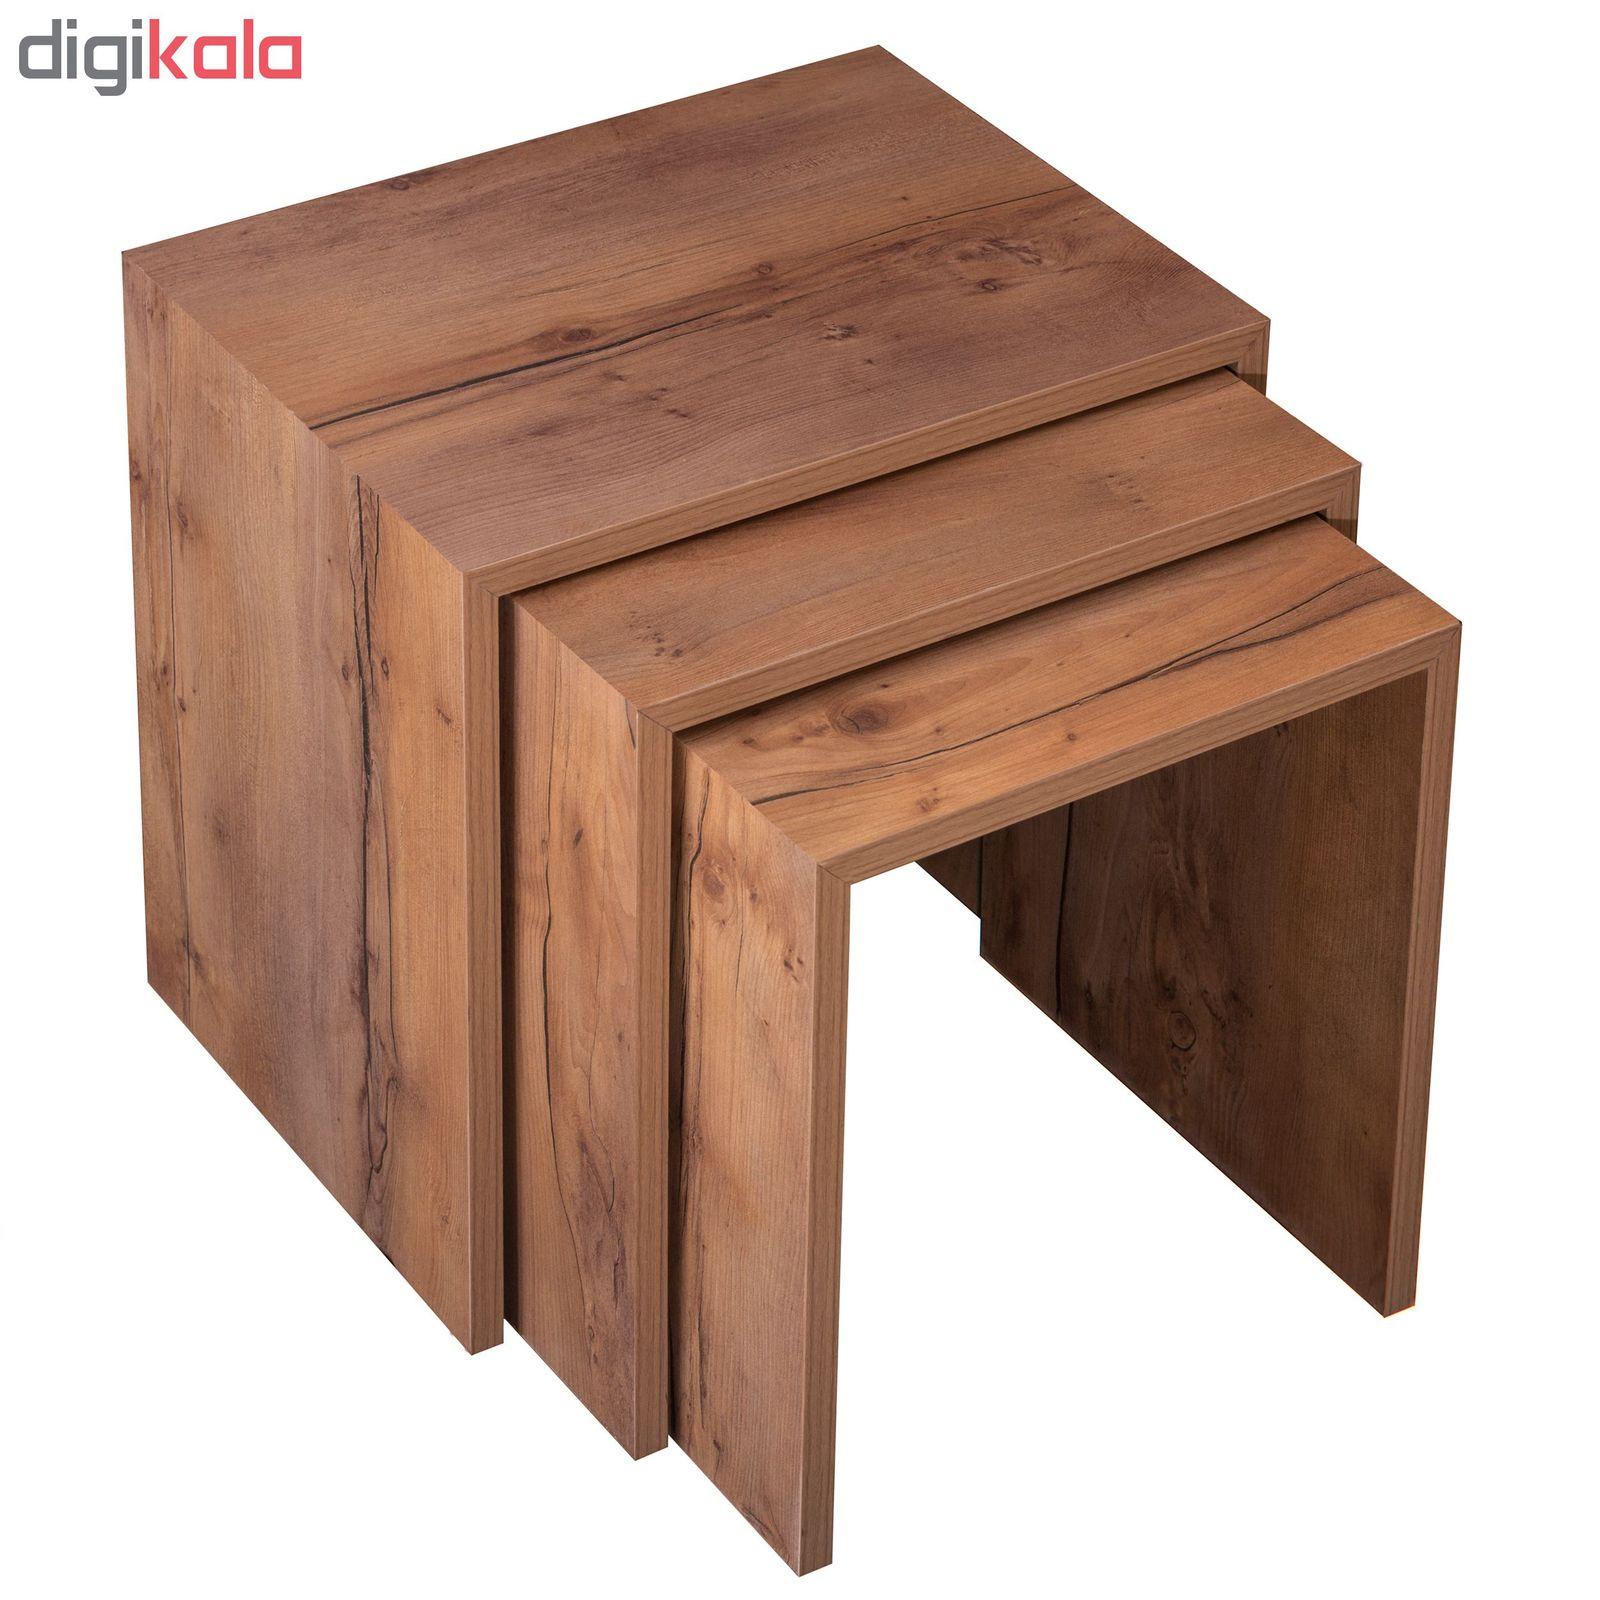 میز عسلی مدل ST1 مجموعه 3 عددی main 1 1